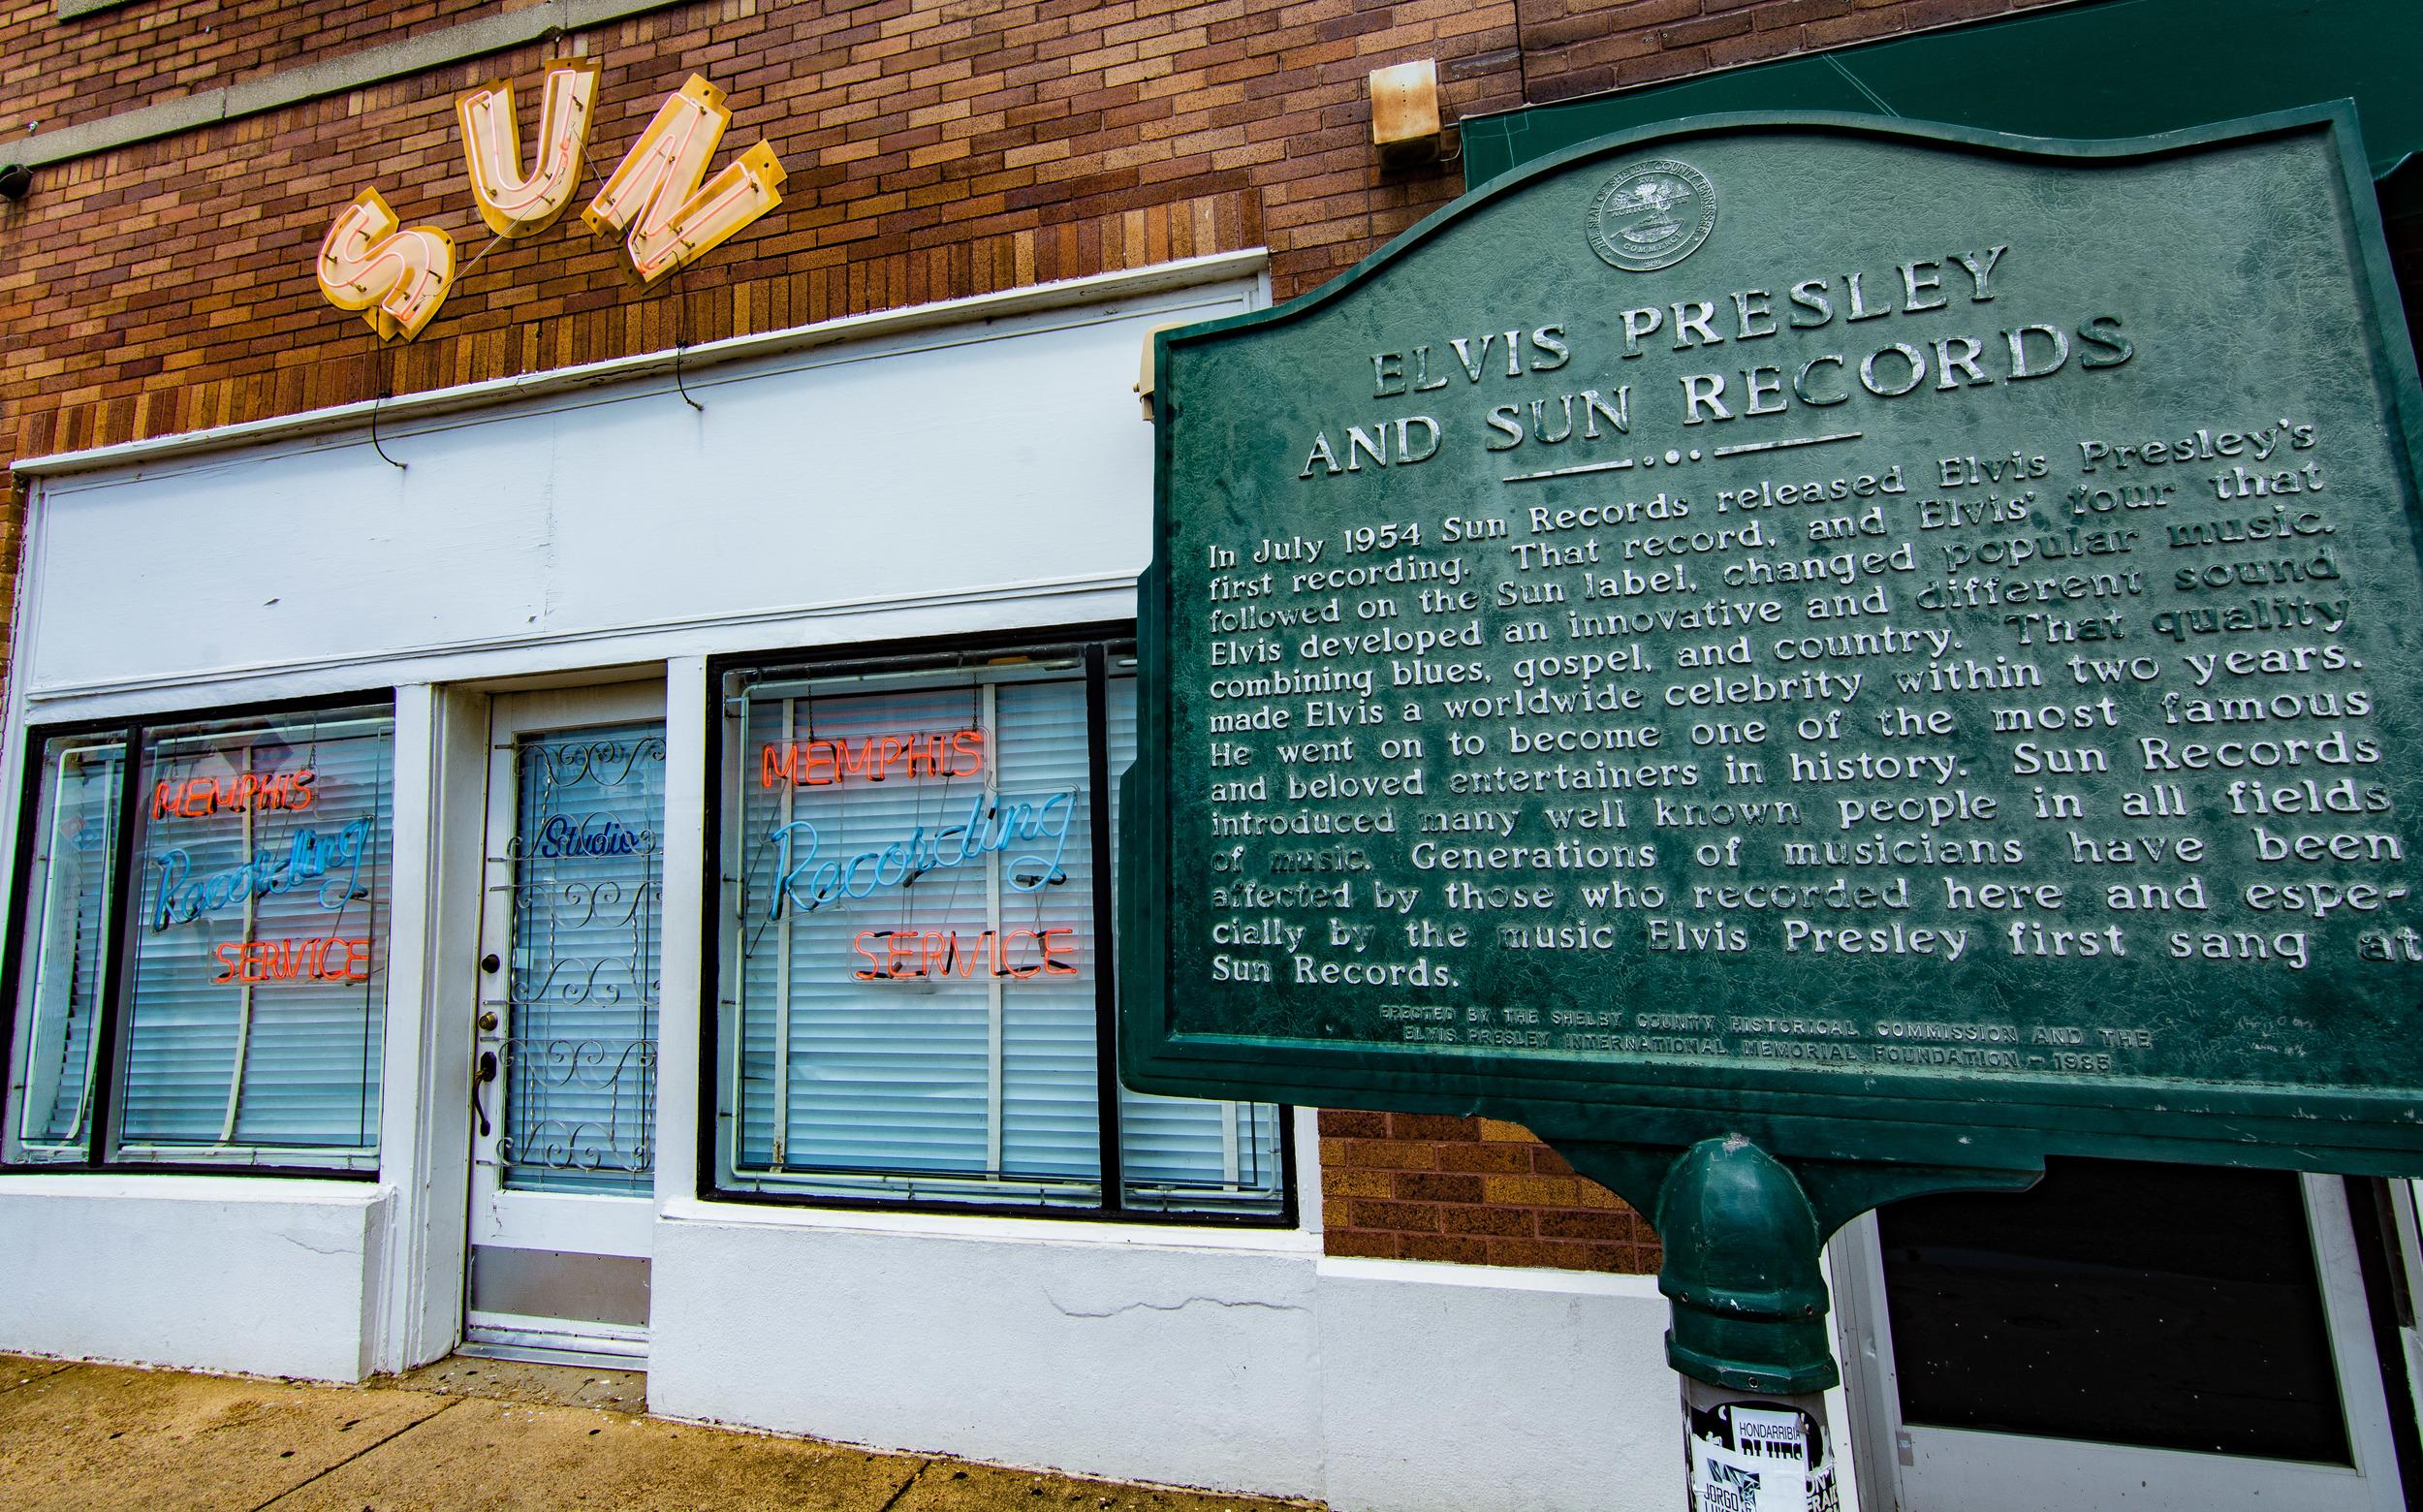 The legendary Sun Studio. Great tour!